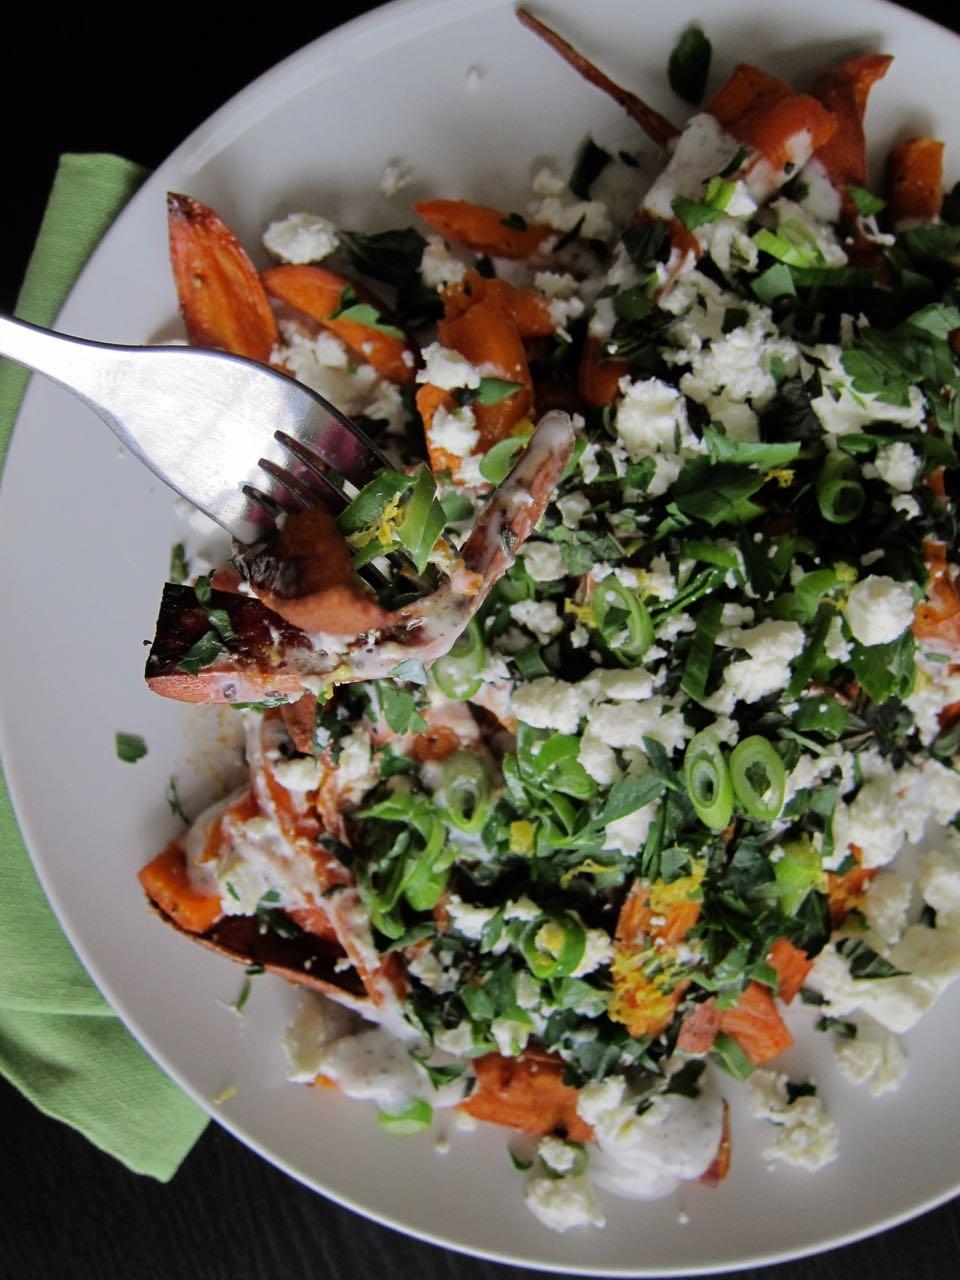 Sumac Yogurt and Herbs Roasted Sweet potatoes